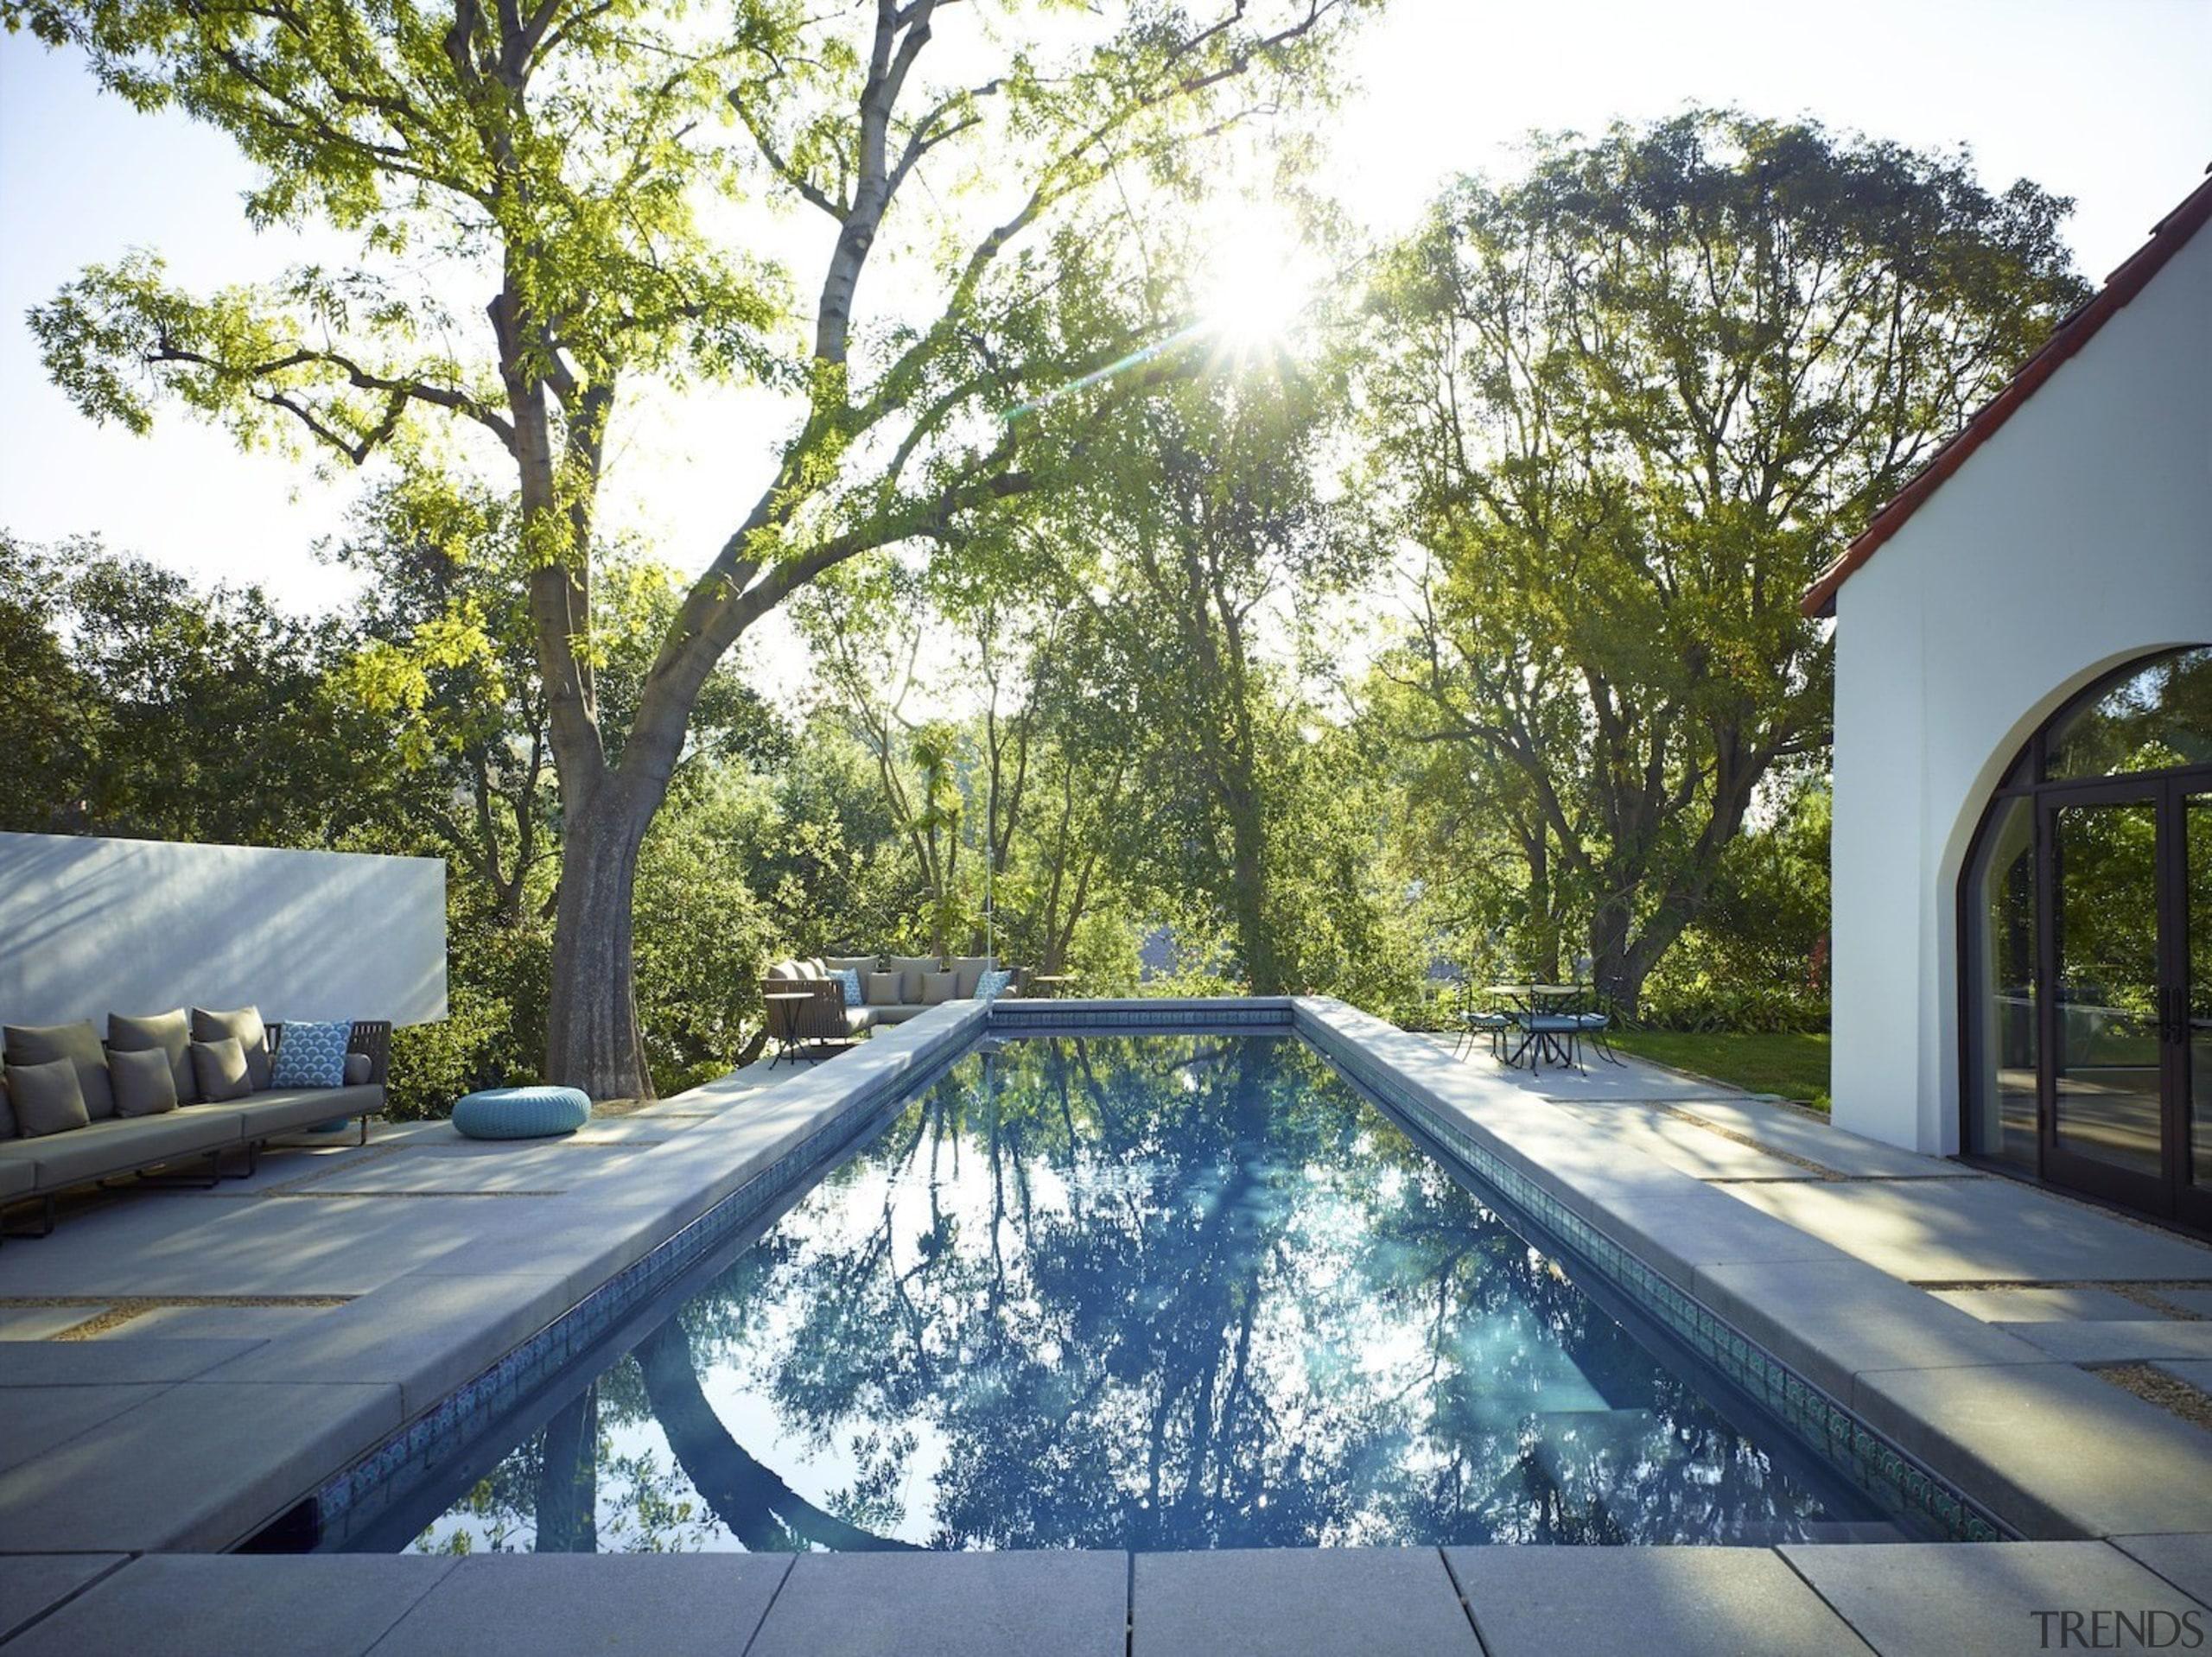 Trees throw shadows down onto the pool area architecture, backyard, estate, home, house, plant, property, real estate, residential area, swimming pool, tree, white